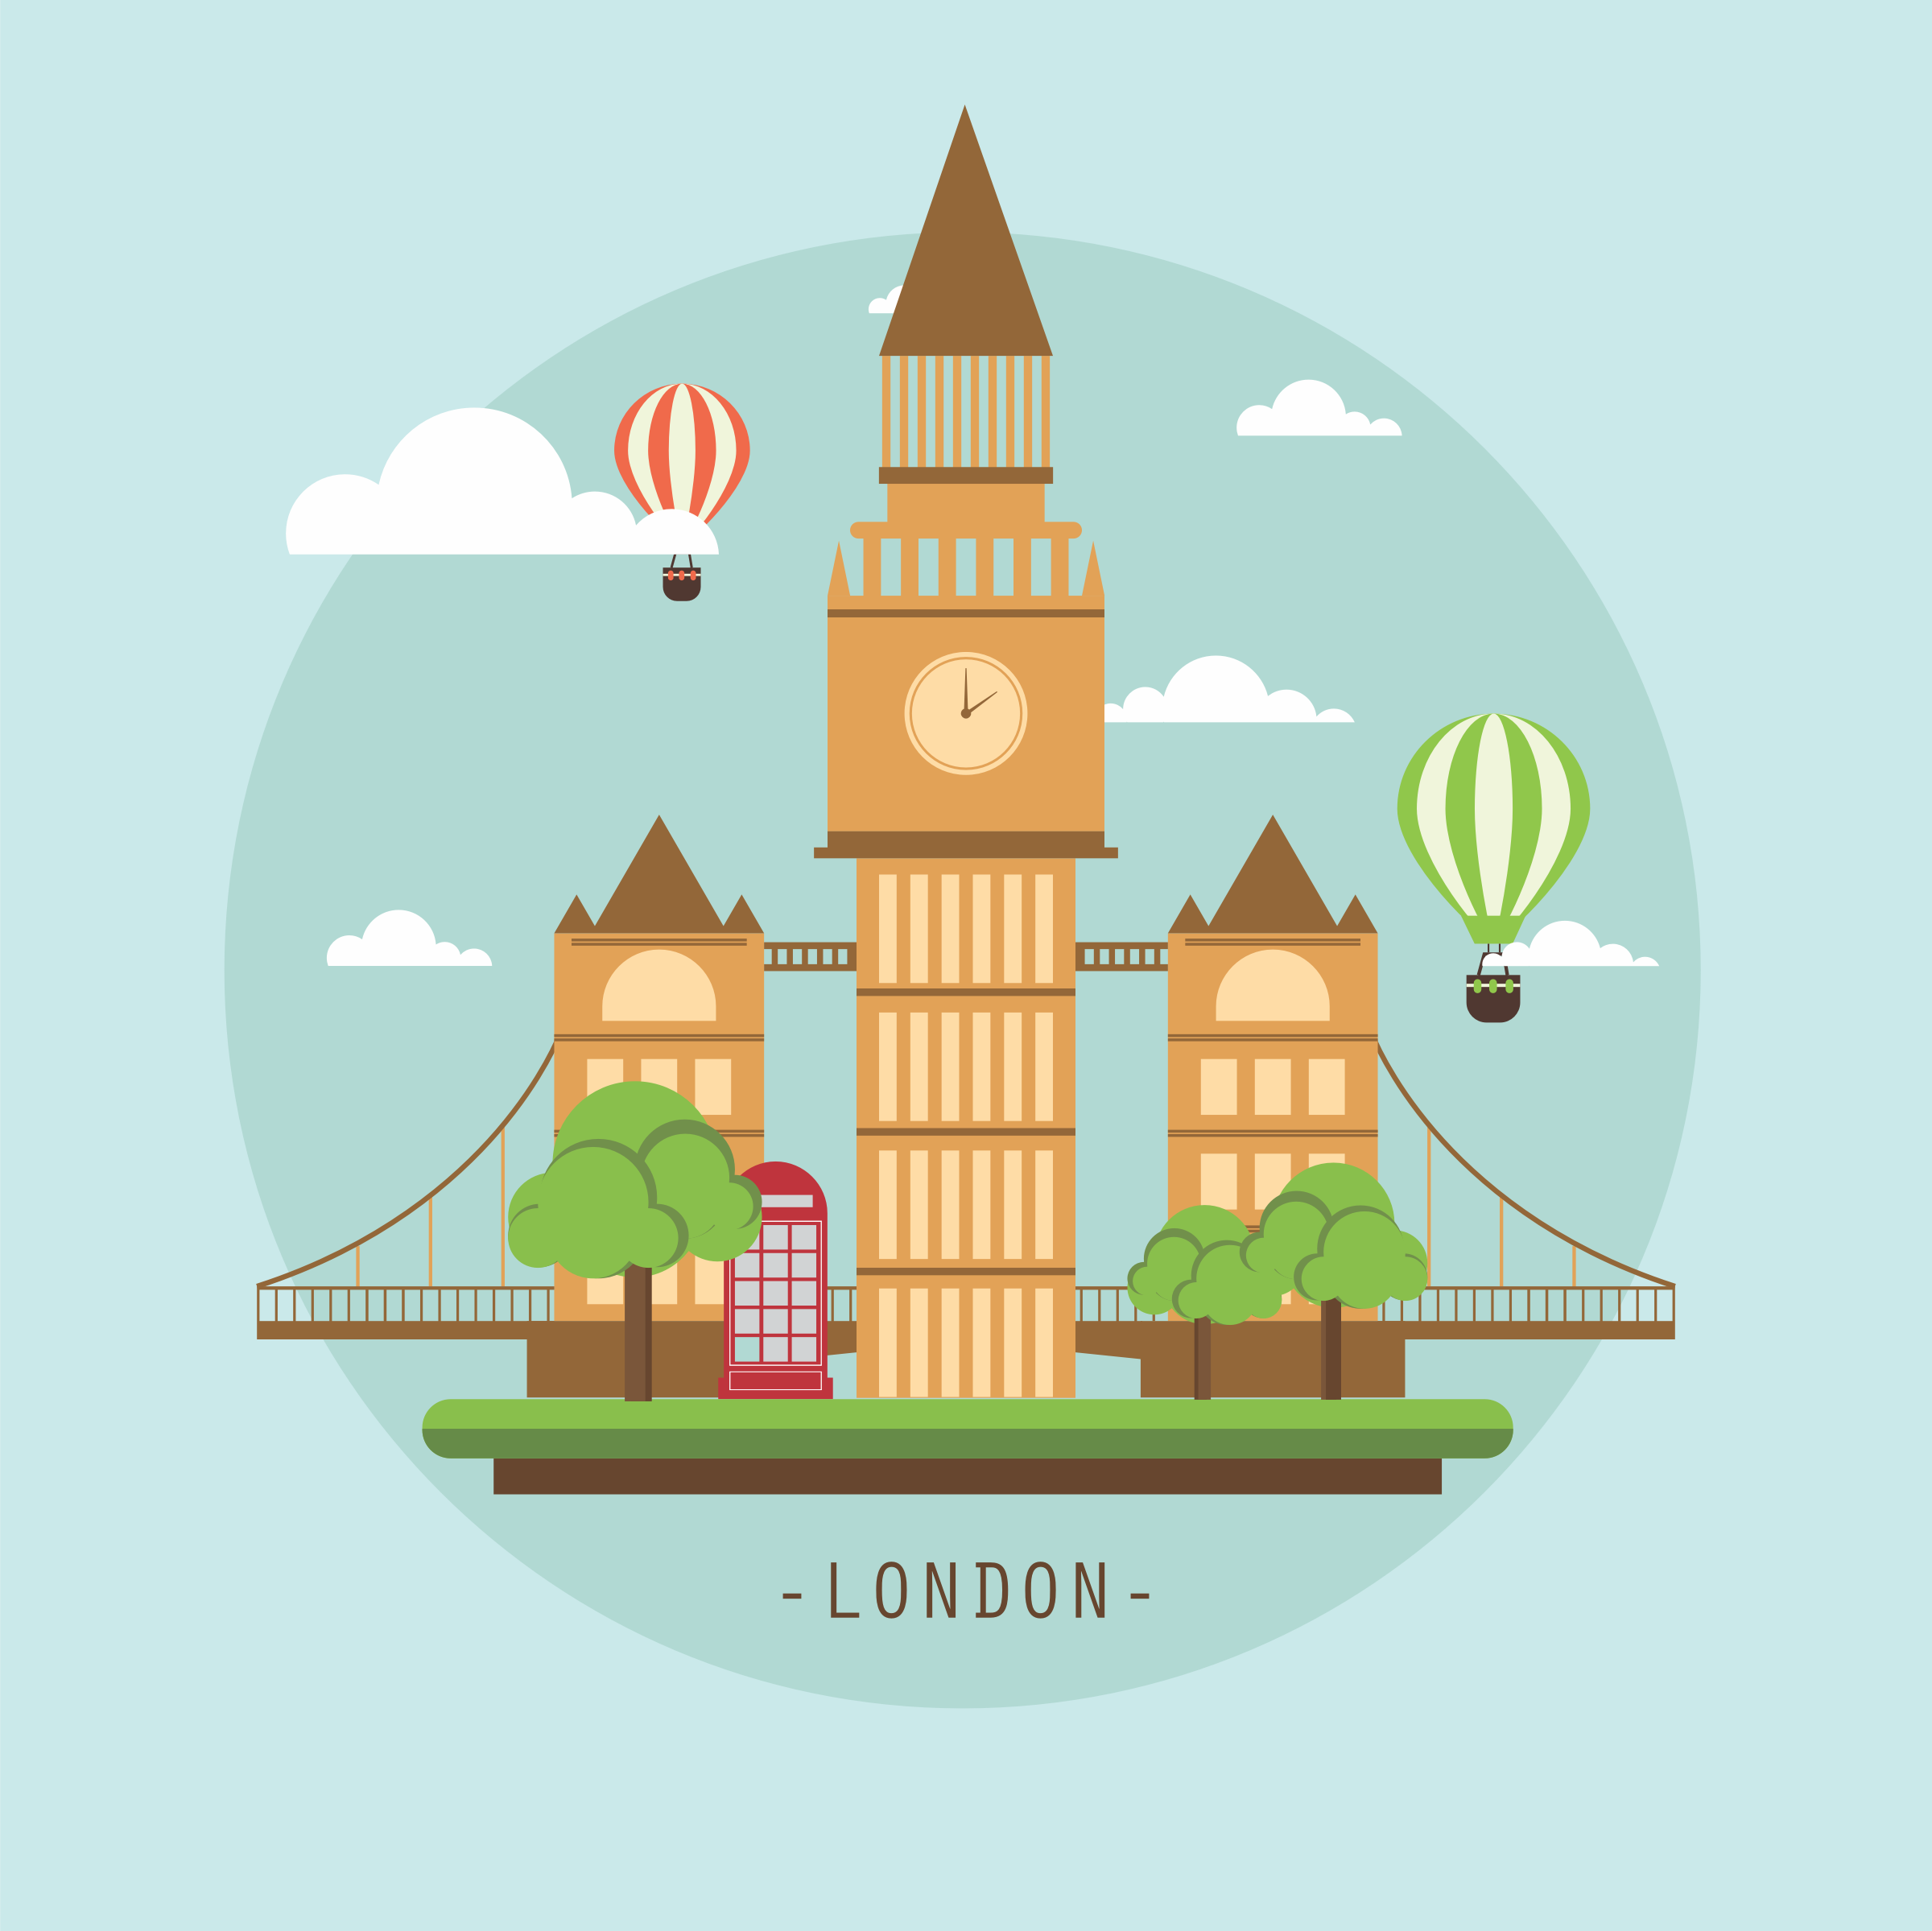 Landmarks big image png. London clipart landmark